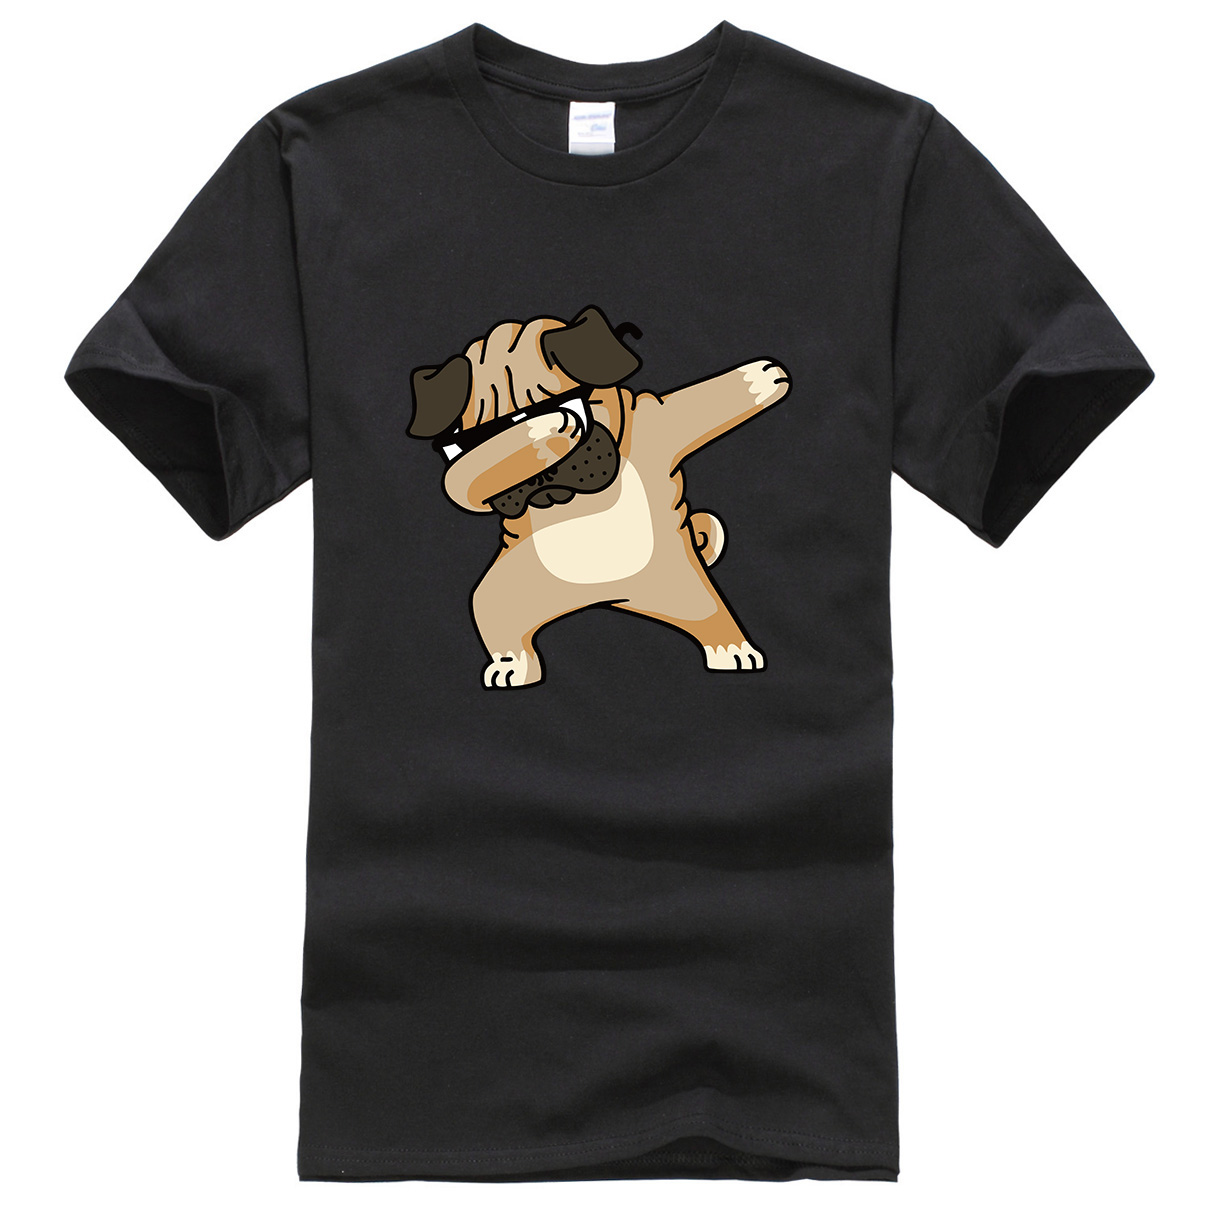 DABBING PUG Fashion Top New 2019 Summer T-shirt Cartoon Animal DOG T Shirt Men Funny Hip Hop Tops Shirts Harajuku Men's T-shirts